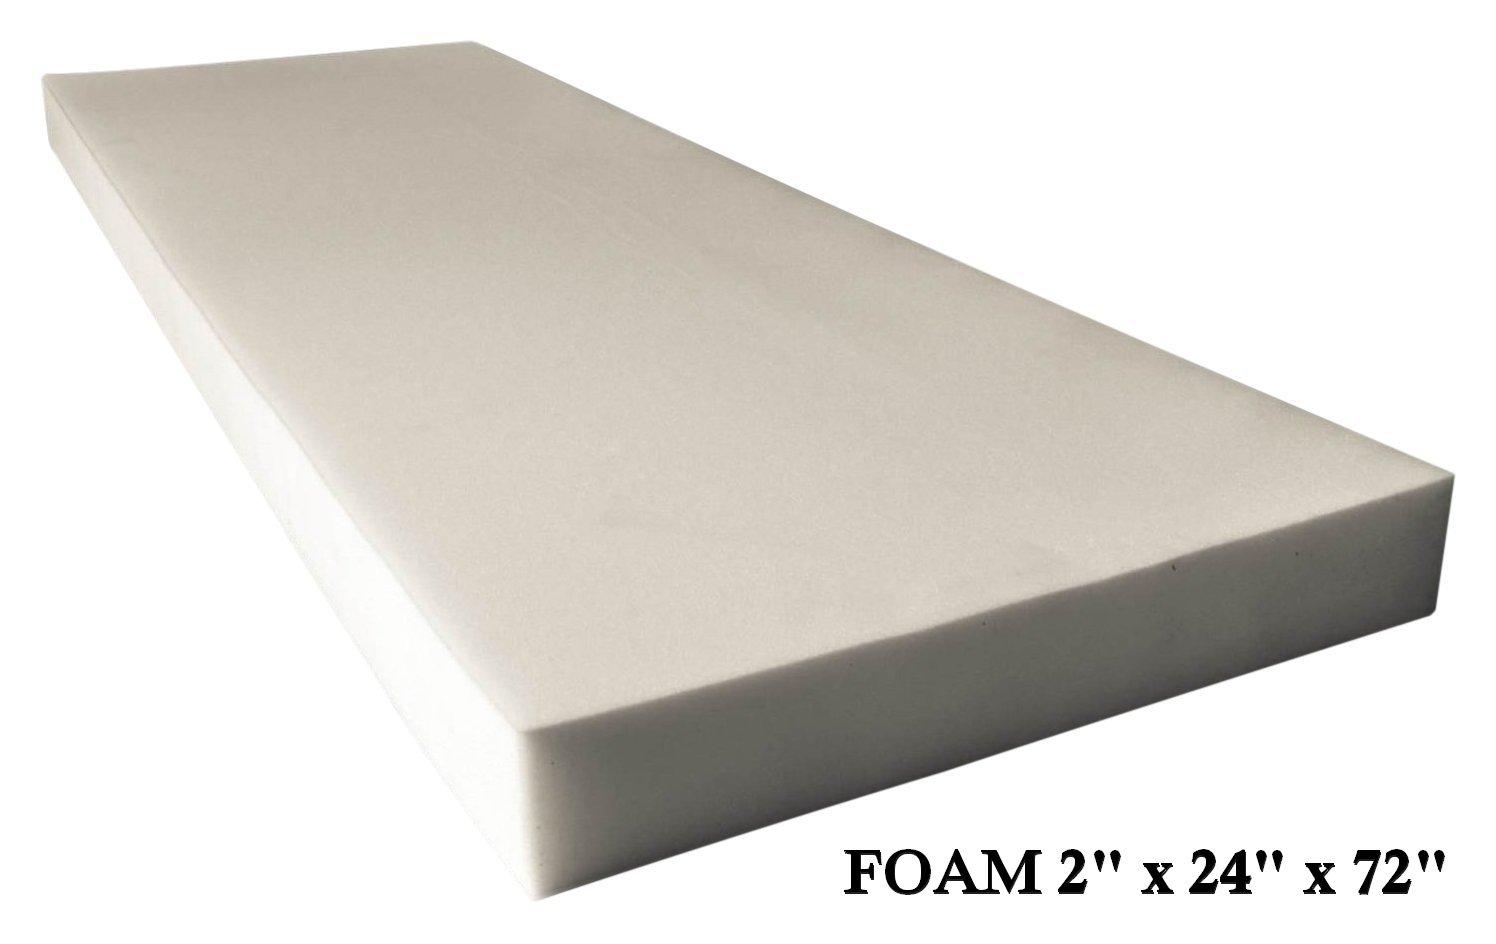 AK TRADING Upholstery Foam High Density Cushion (Seat Replacement, Foam Sheet, Foam Padding), 2'' H x 24'' W x 72'' L by AK TRADING